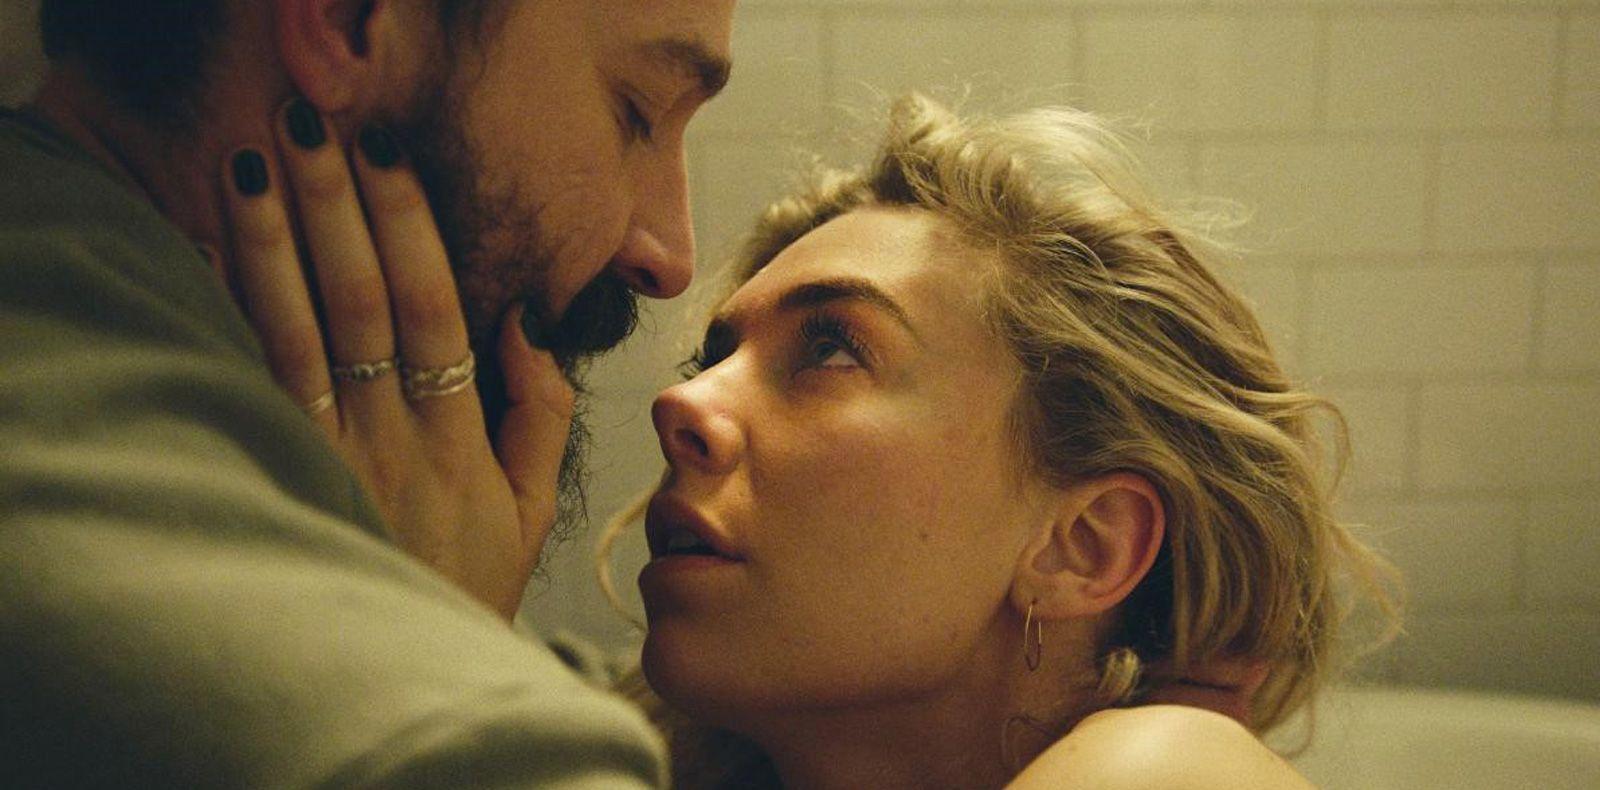 Recensione Film Pieces Of A Woman Netflix Mundruczó